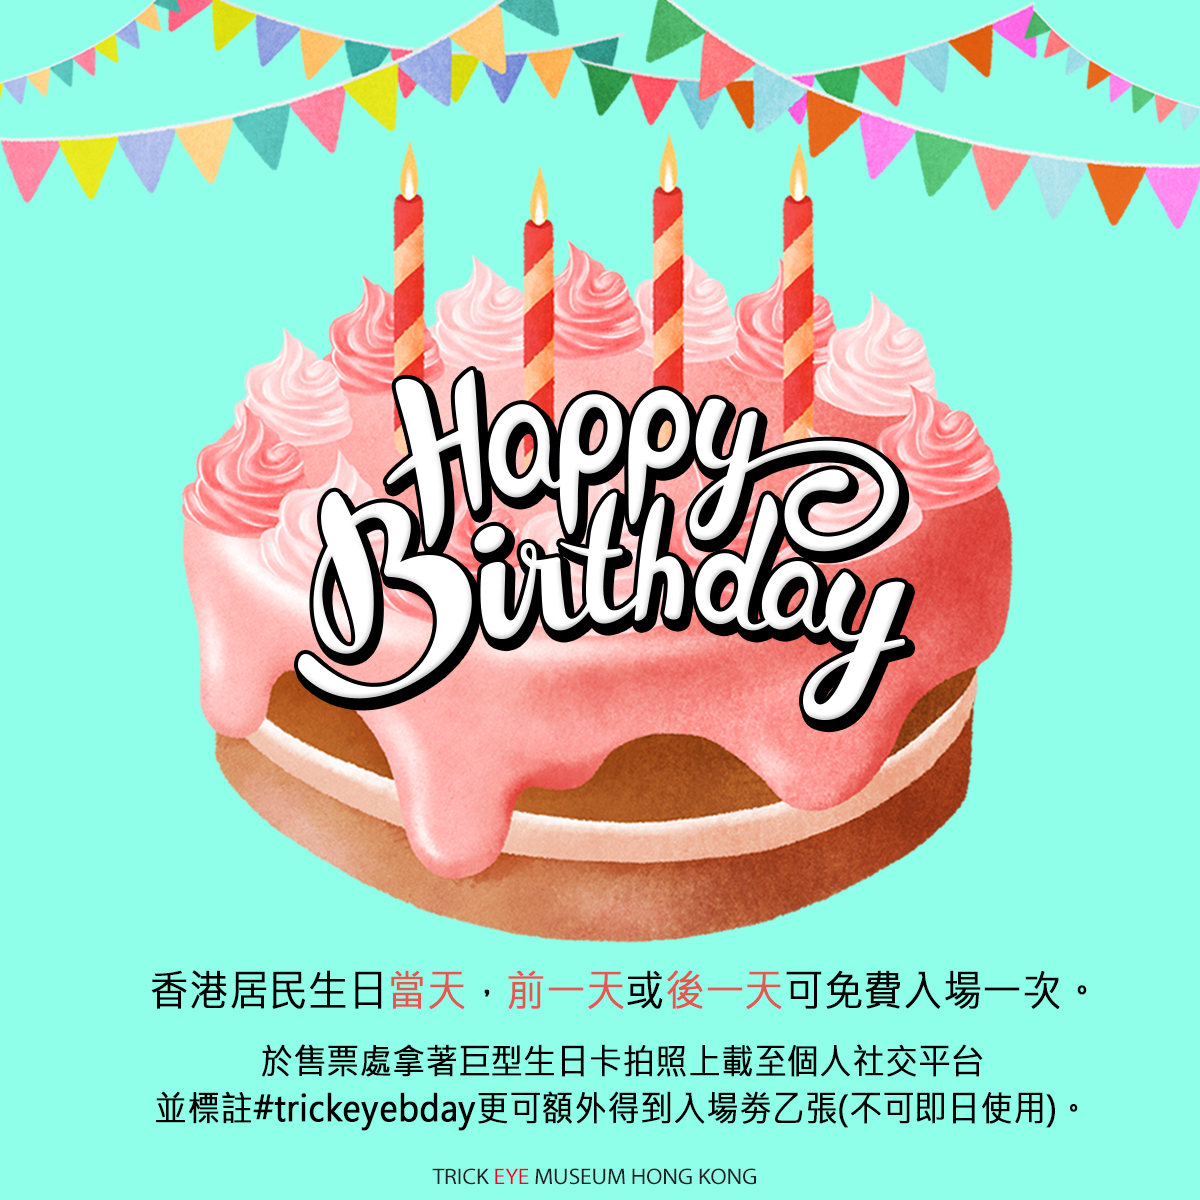 https://2.bp.blogspot.com/-trLOphy41iU/WGgwtA9WWlI/AAAAAAAJi9w/6fPShPFTBYEwucIHv-F4gi0ZbliWtnopACLcB/s1600/New-Birthday-Event-Visual_20161024.jpg